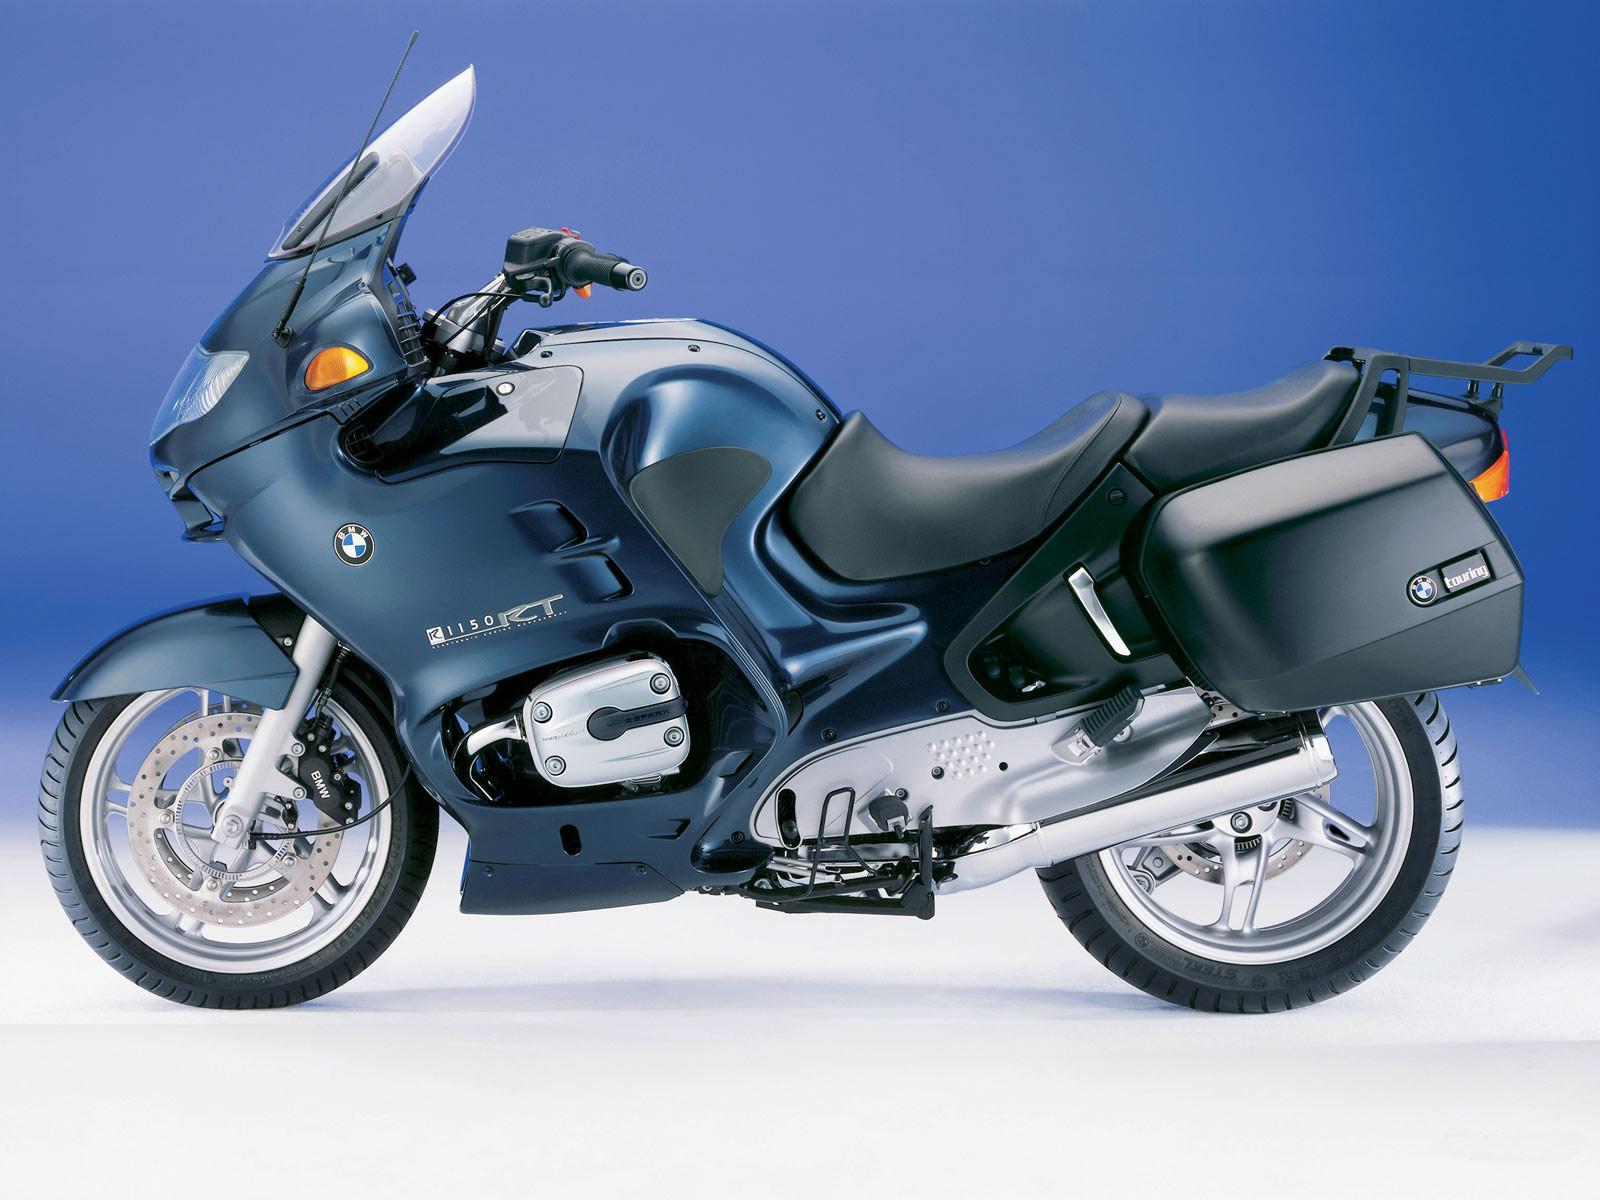 2004 bmw r 1150 rt motorcycle desktop wallpapers insurance. Black Bedroom Furniture Sets. Home Design Ideas